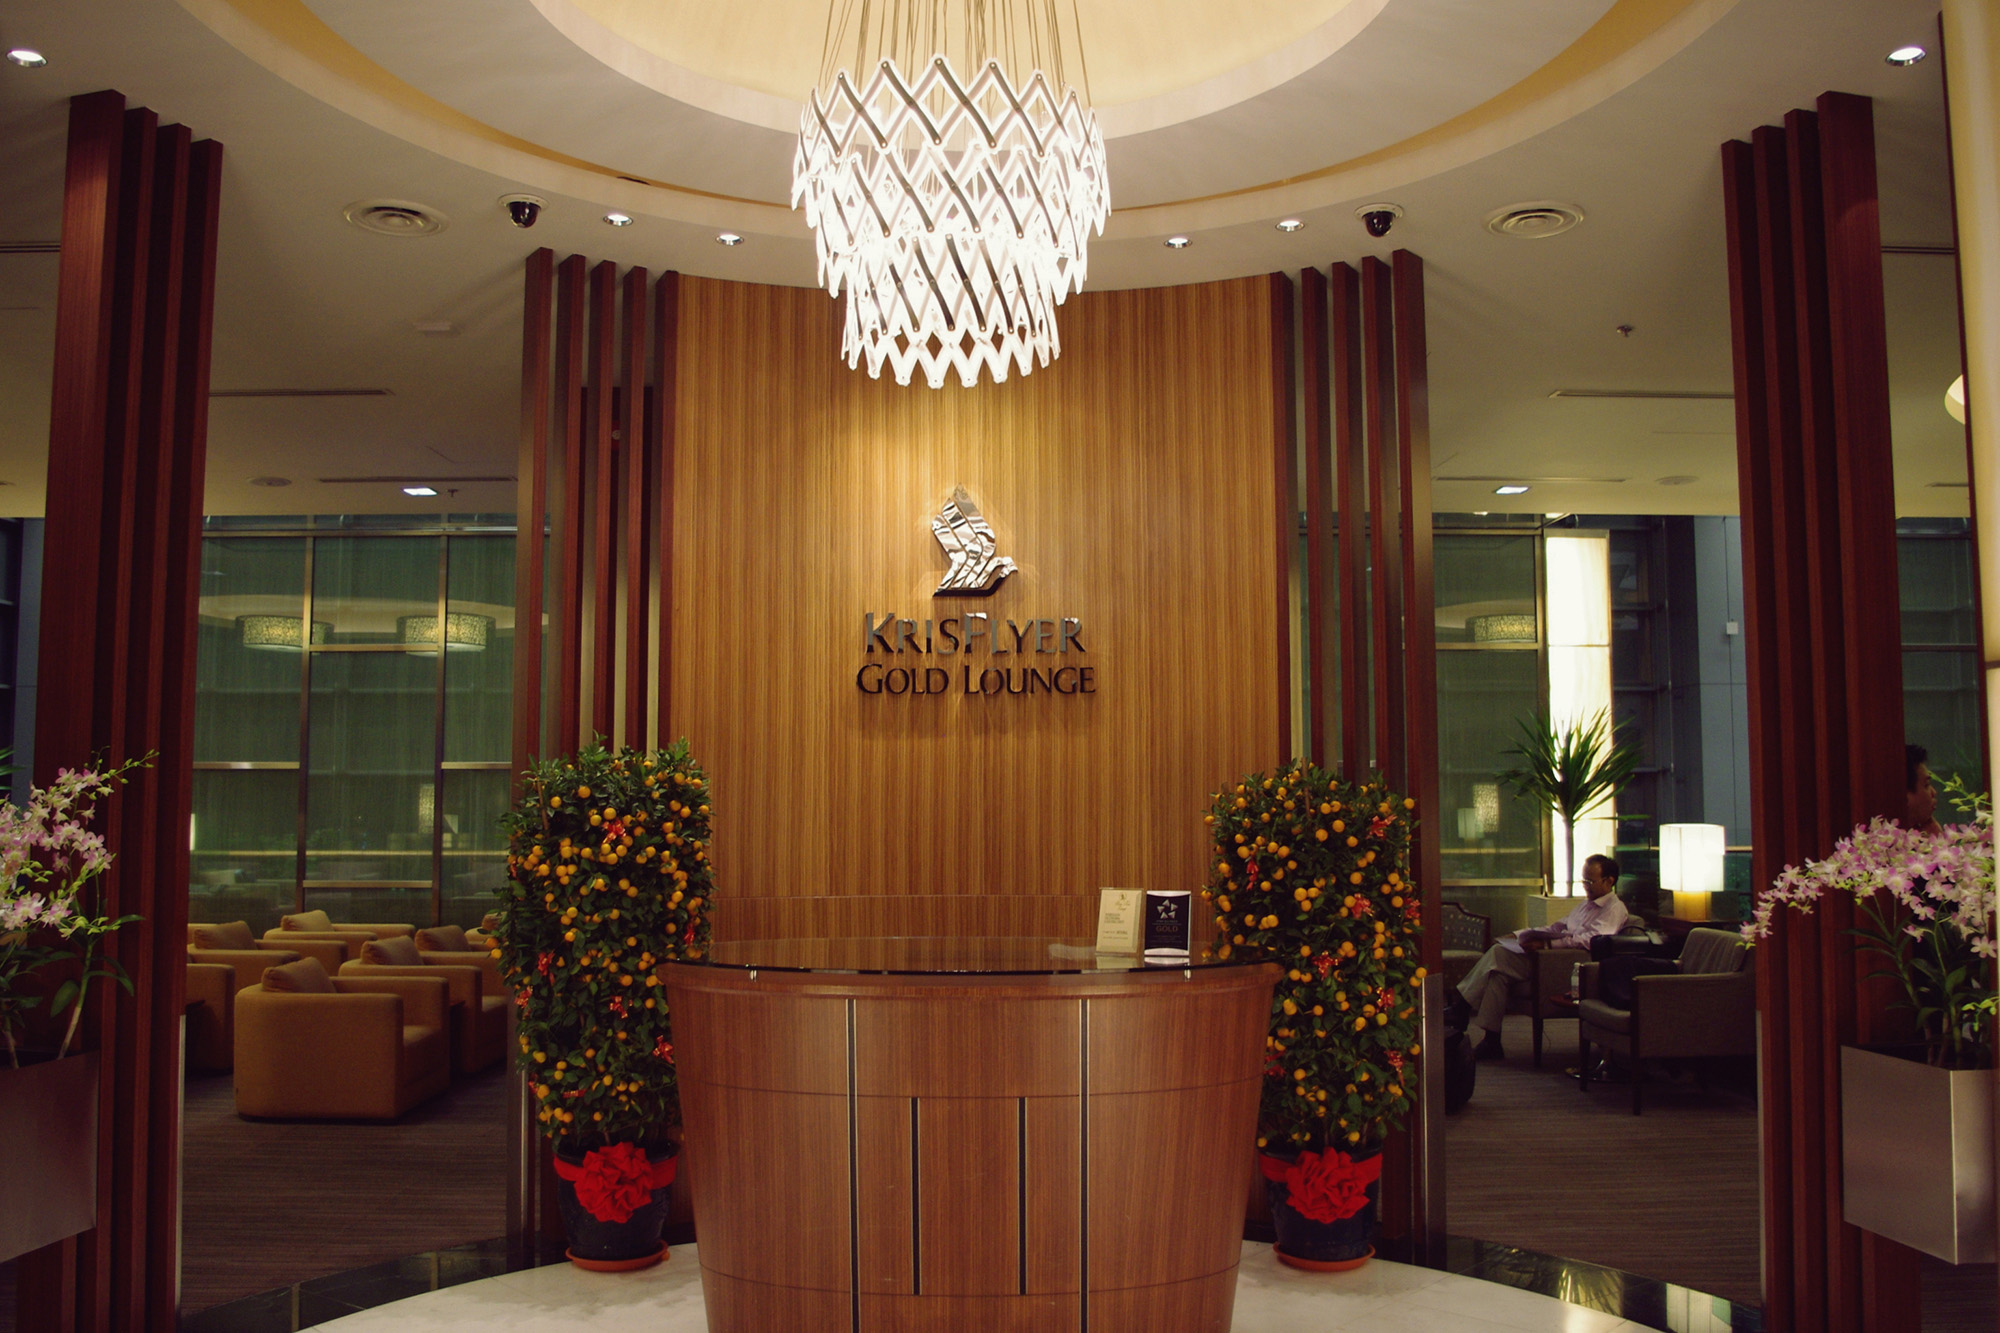 KF Gold Lounge Changi T3 (Matt@TWN)